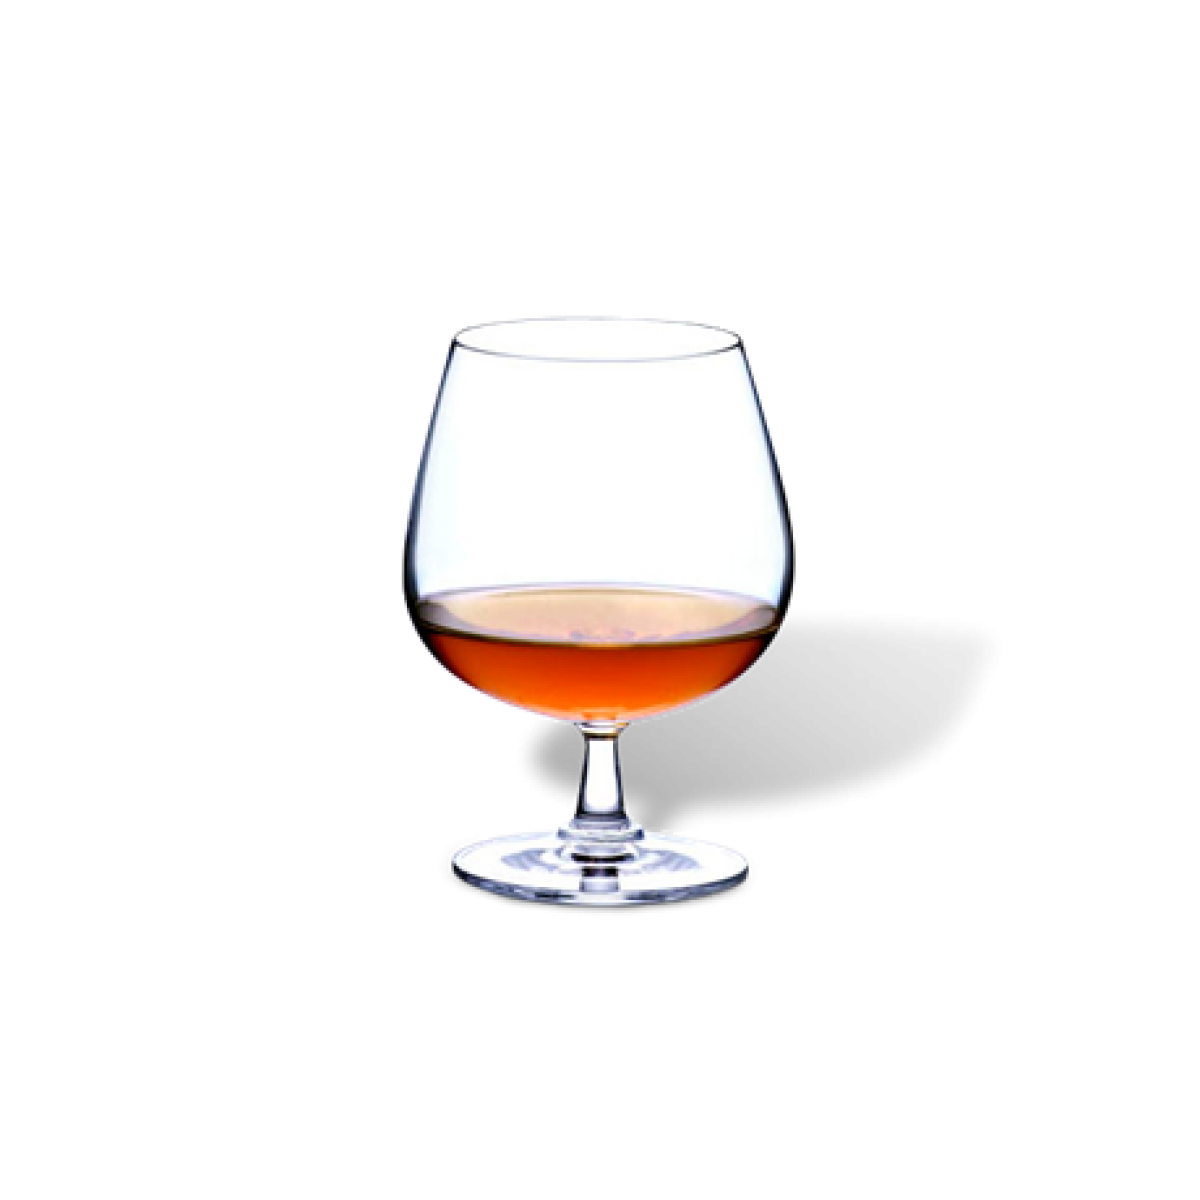 ROSENDAHL Grand Cru cognacglas 2 stk.